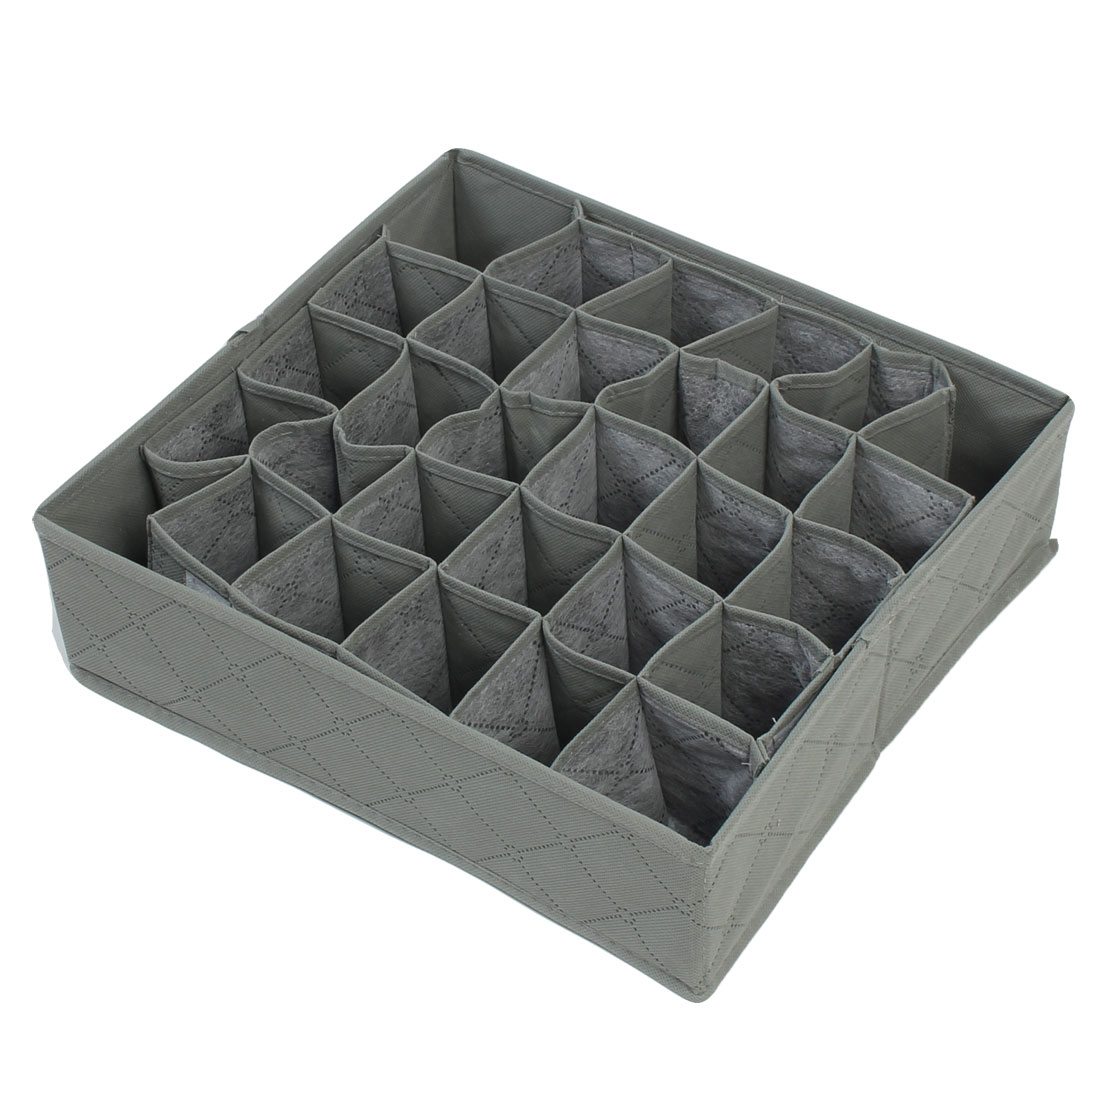 Bamboo Fiber Folding 30 Compartment Removable Tie Necktie Socks Organizer Storage Box